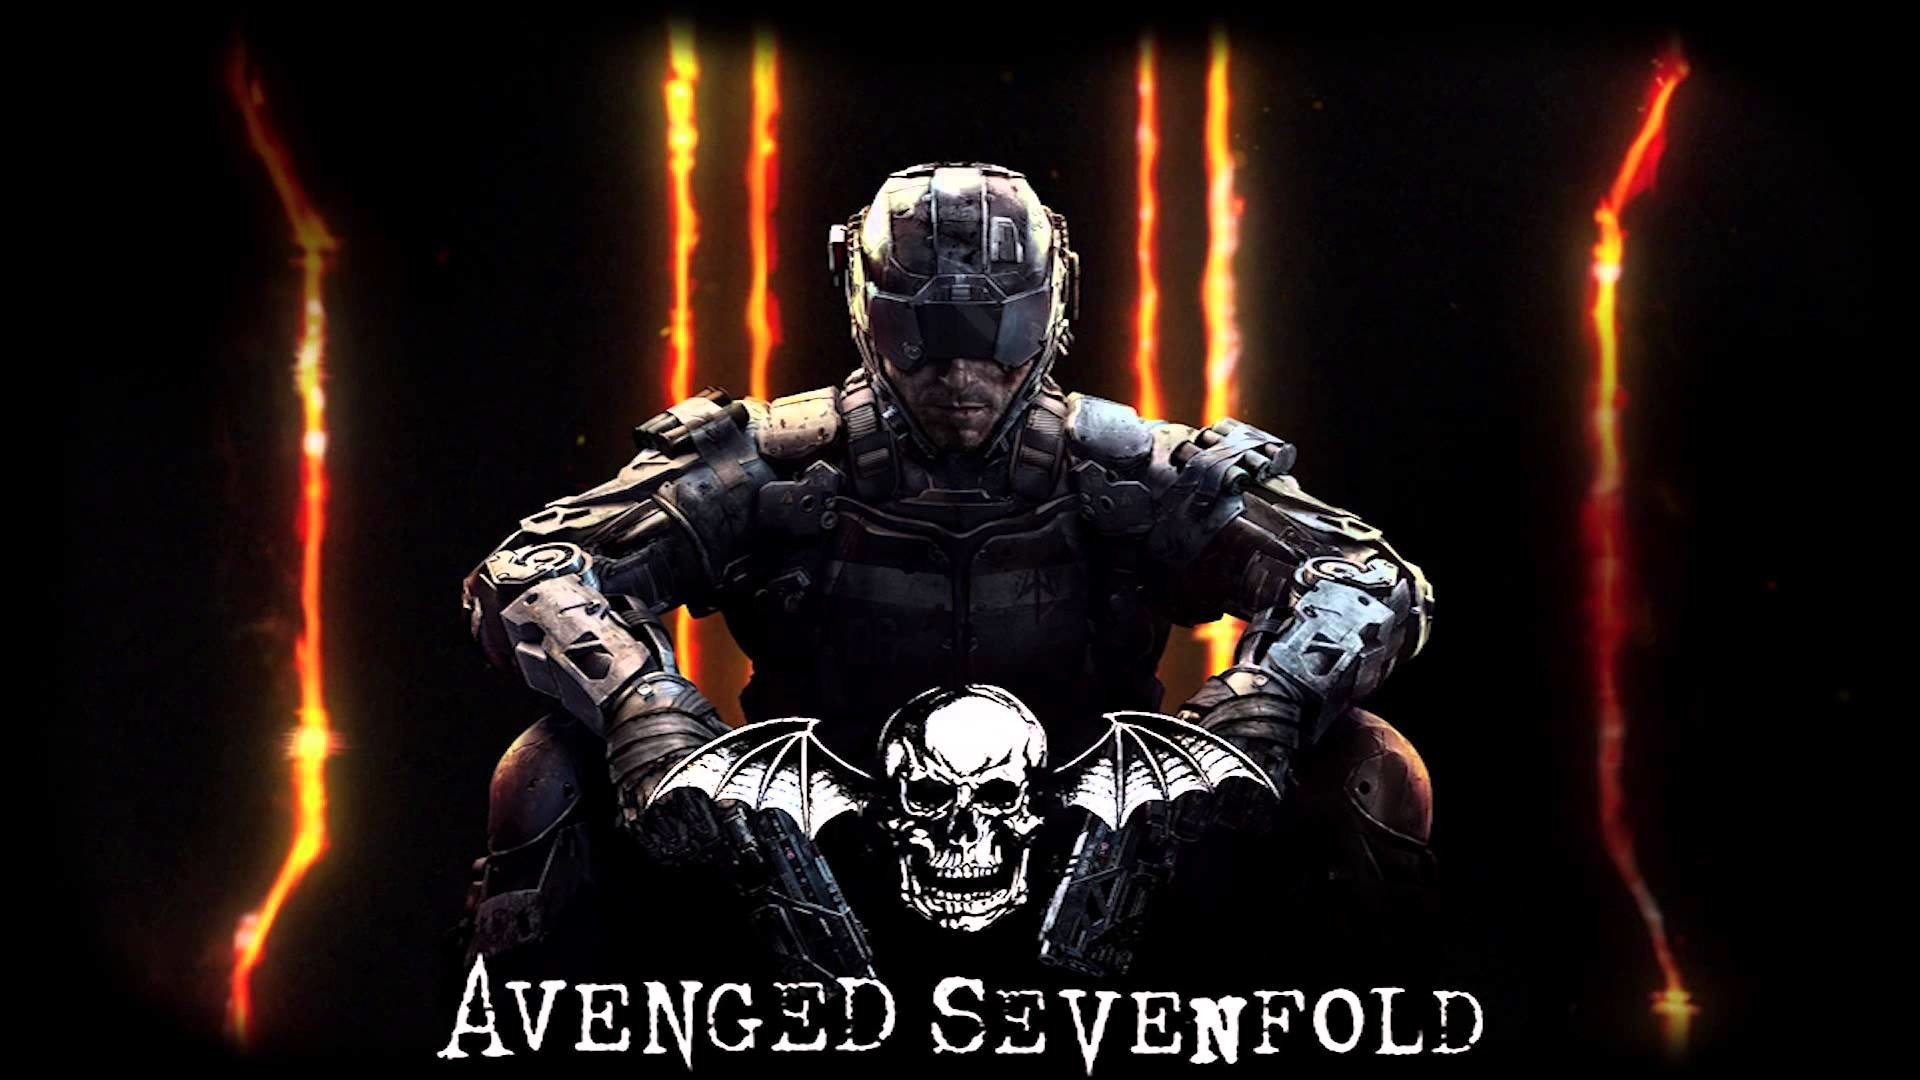 Jade Helm – Avenged Sevenfold [Call of Duty: Black Ops III]